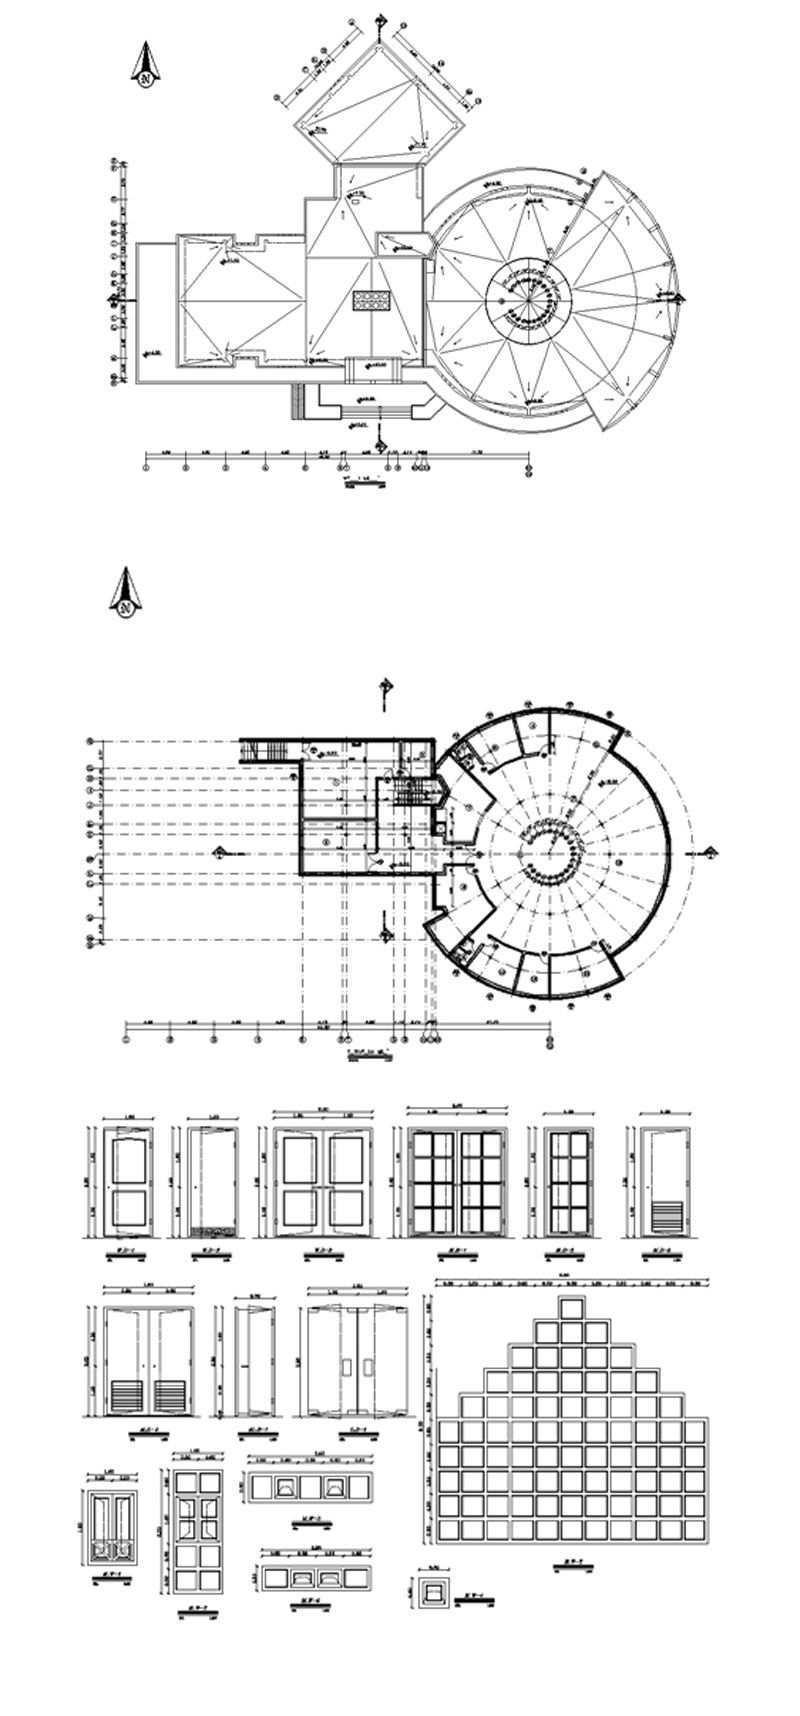 Pin On Download Cad Drawings Autocad Blocks Autocad Symbols Cad Drawings Architecture Details Landscape Details